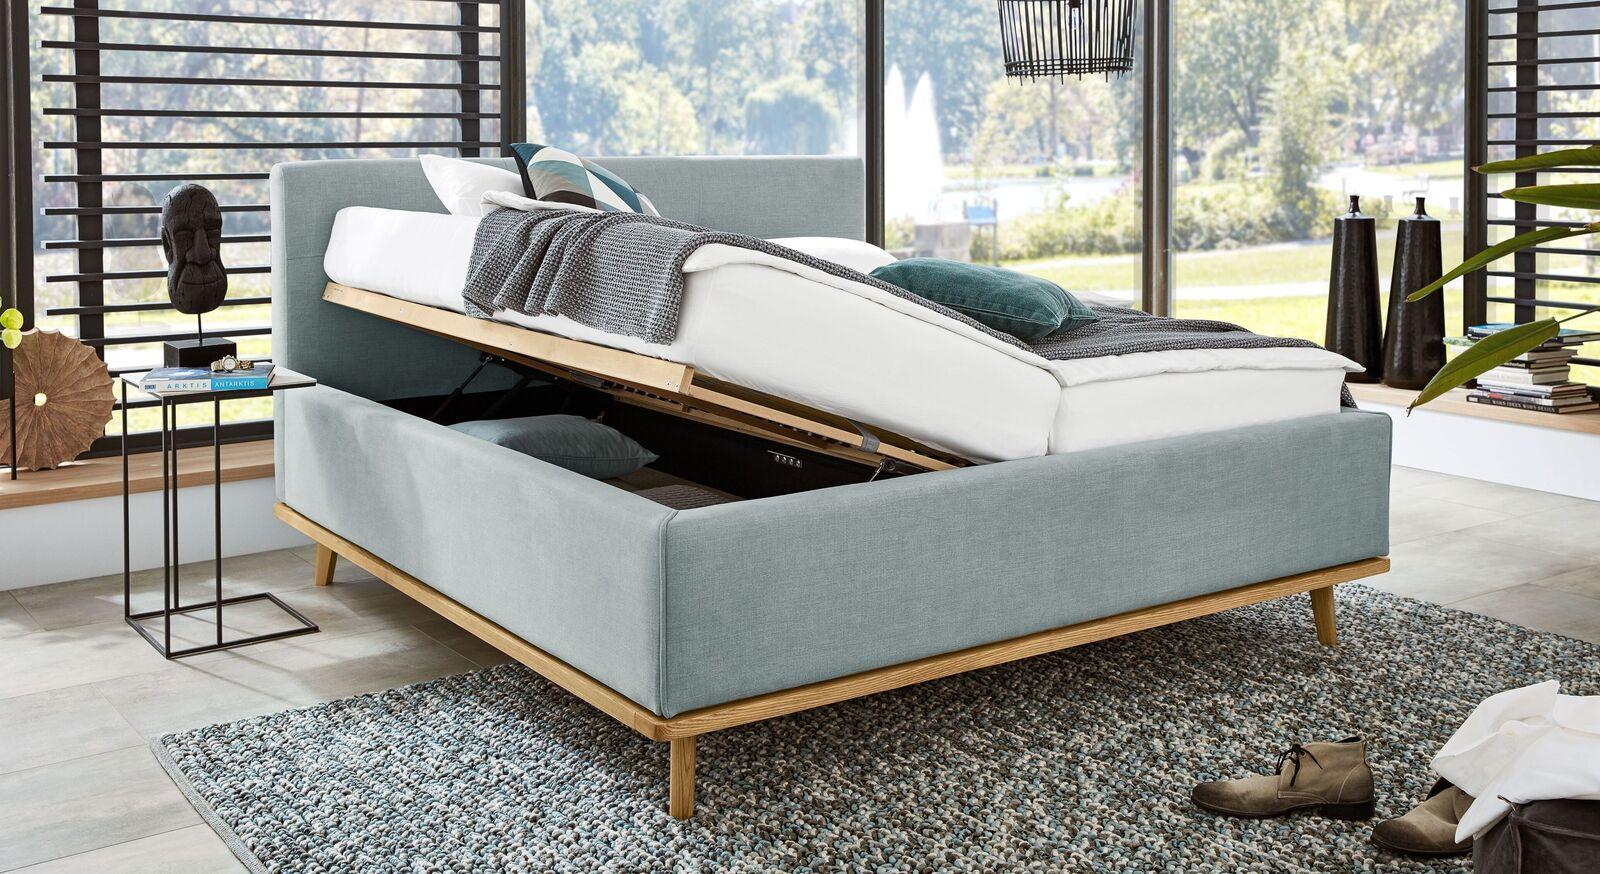 MUSTERRING Polsterbett Delphi Variante A mit praktischem Bettkasten